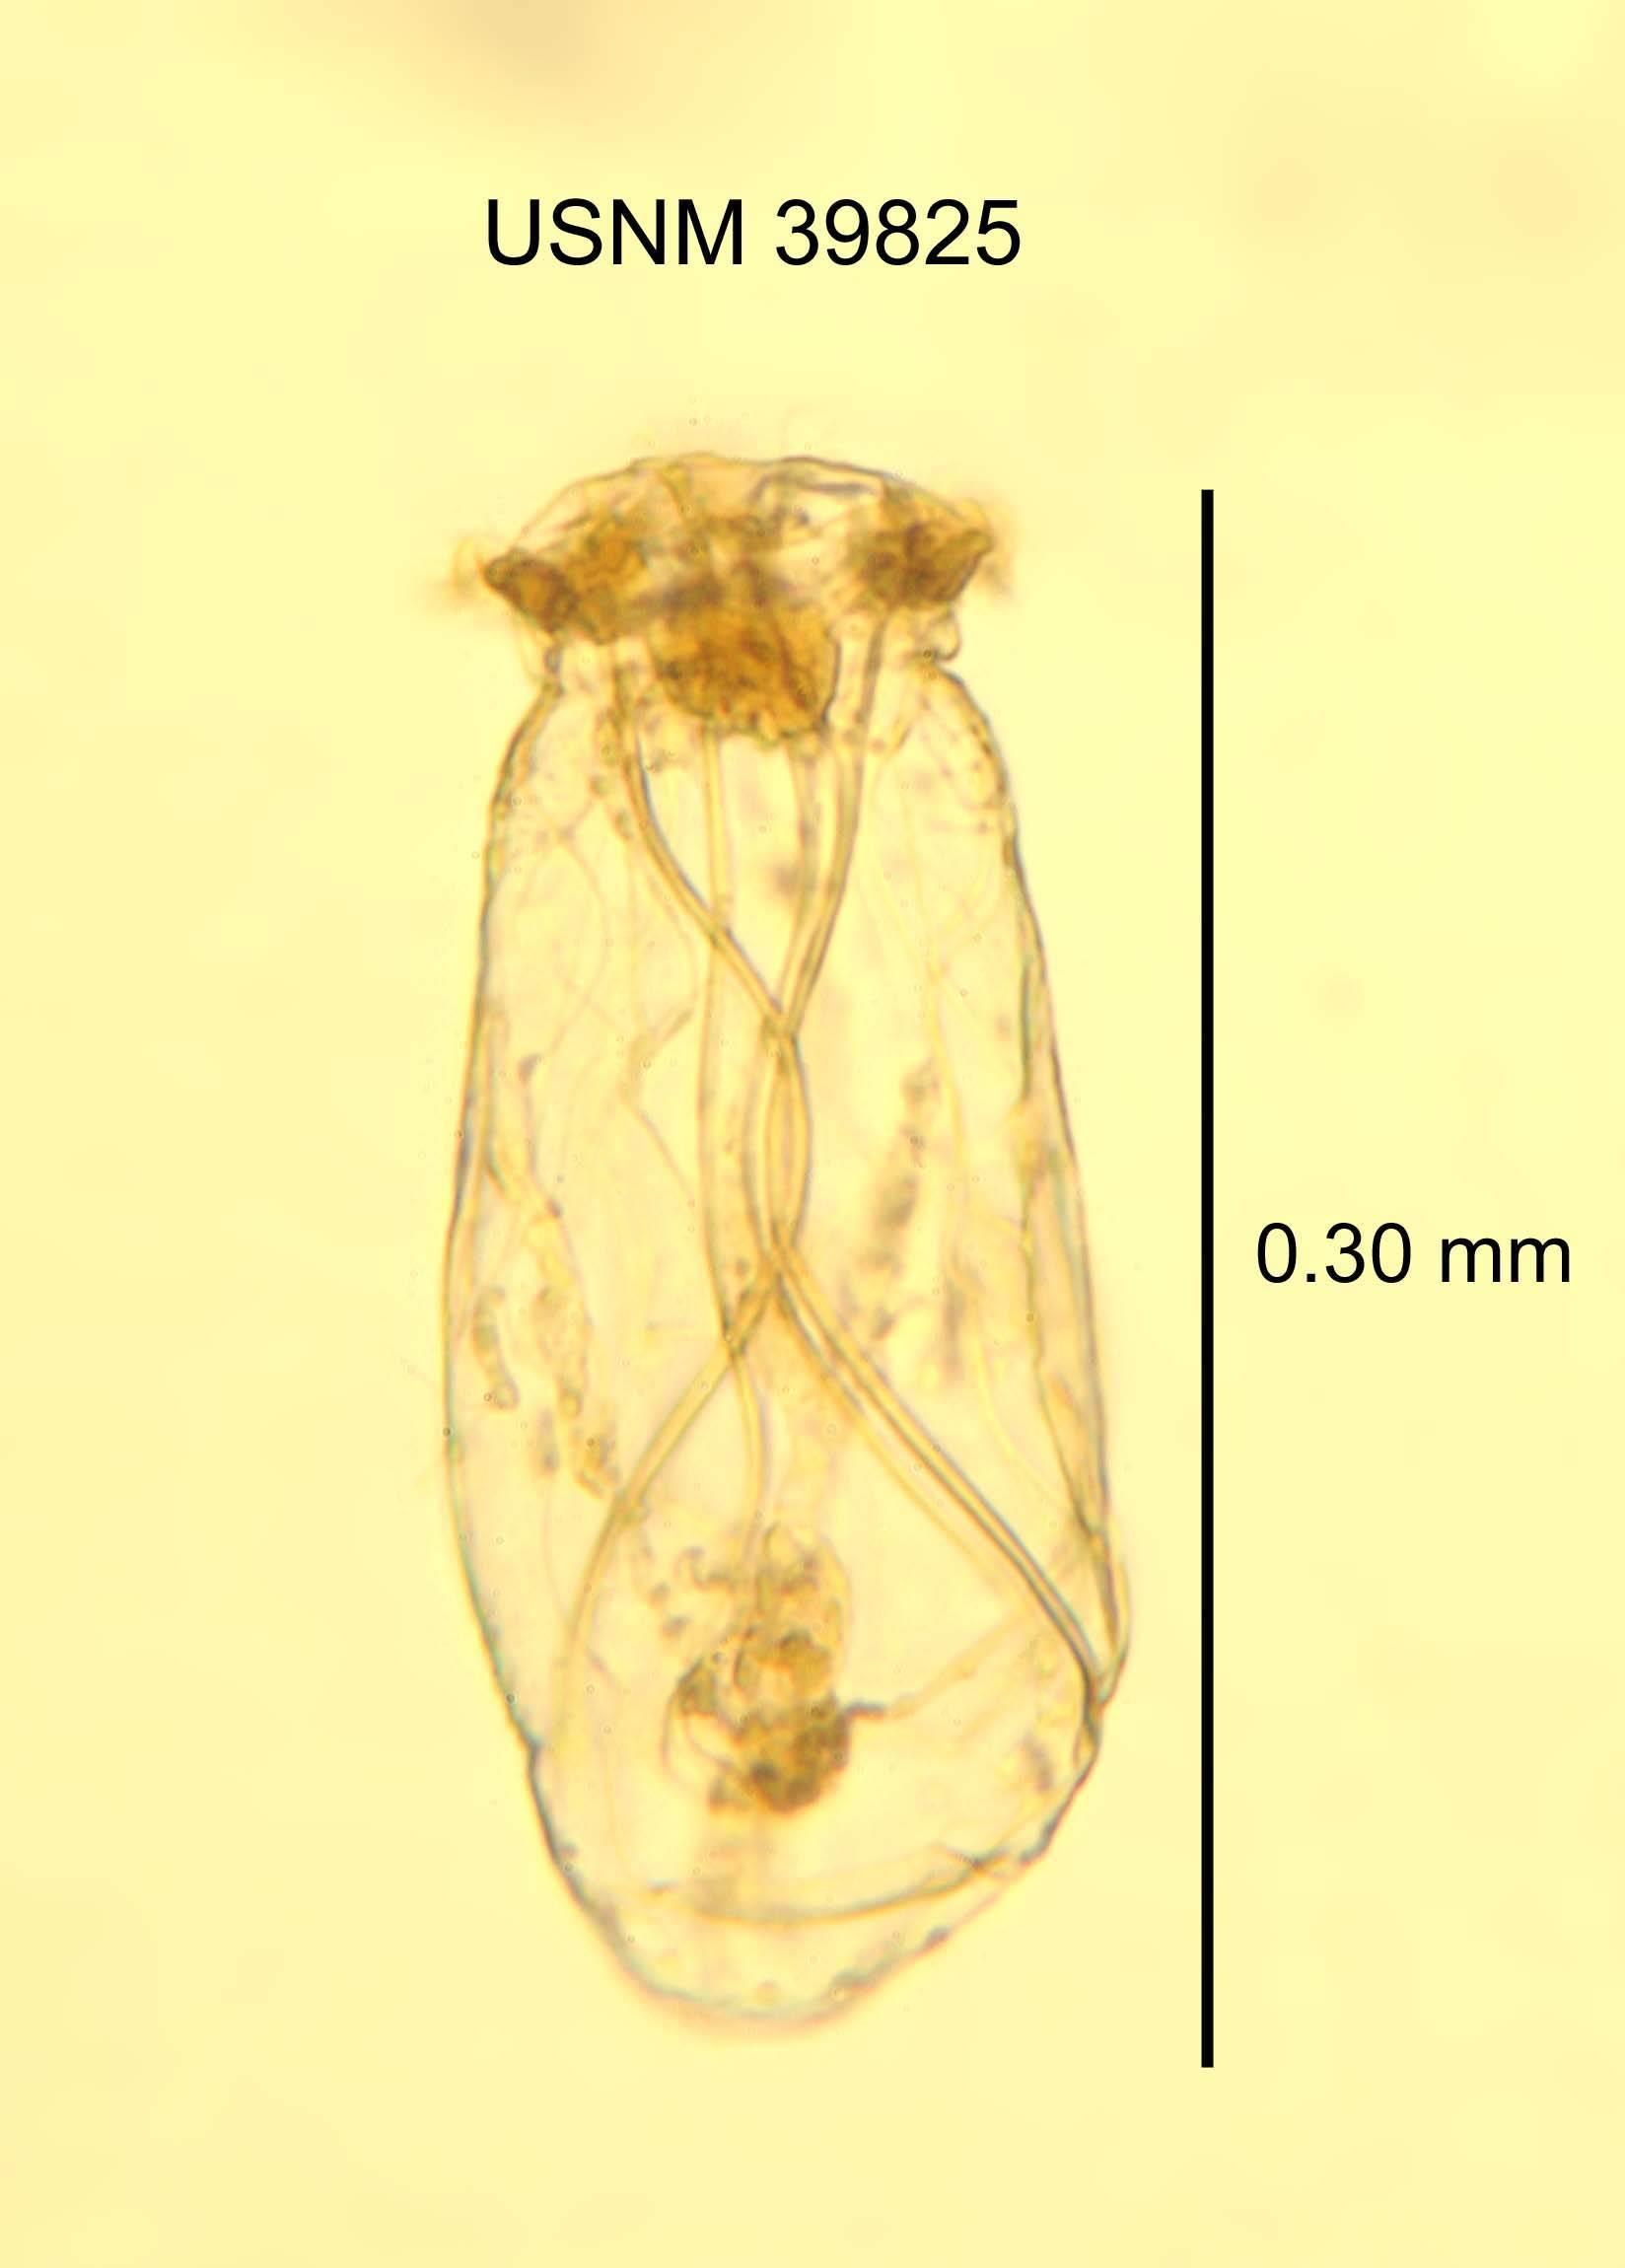 Image of <i>Asplanchna priodonta</i> Gosse 1850